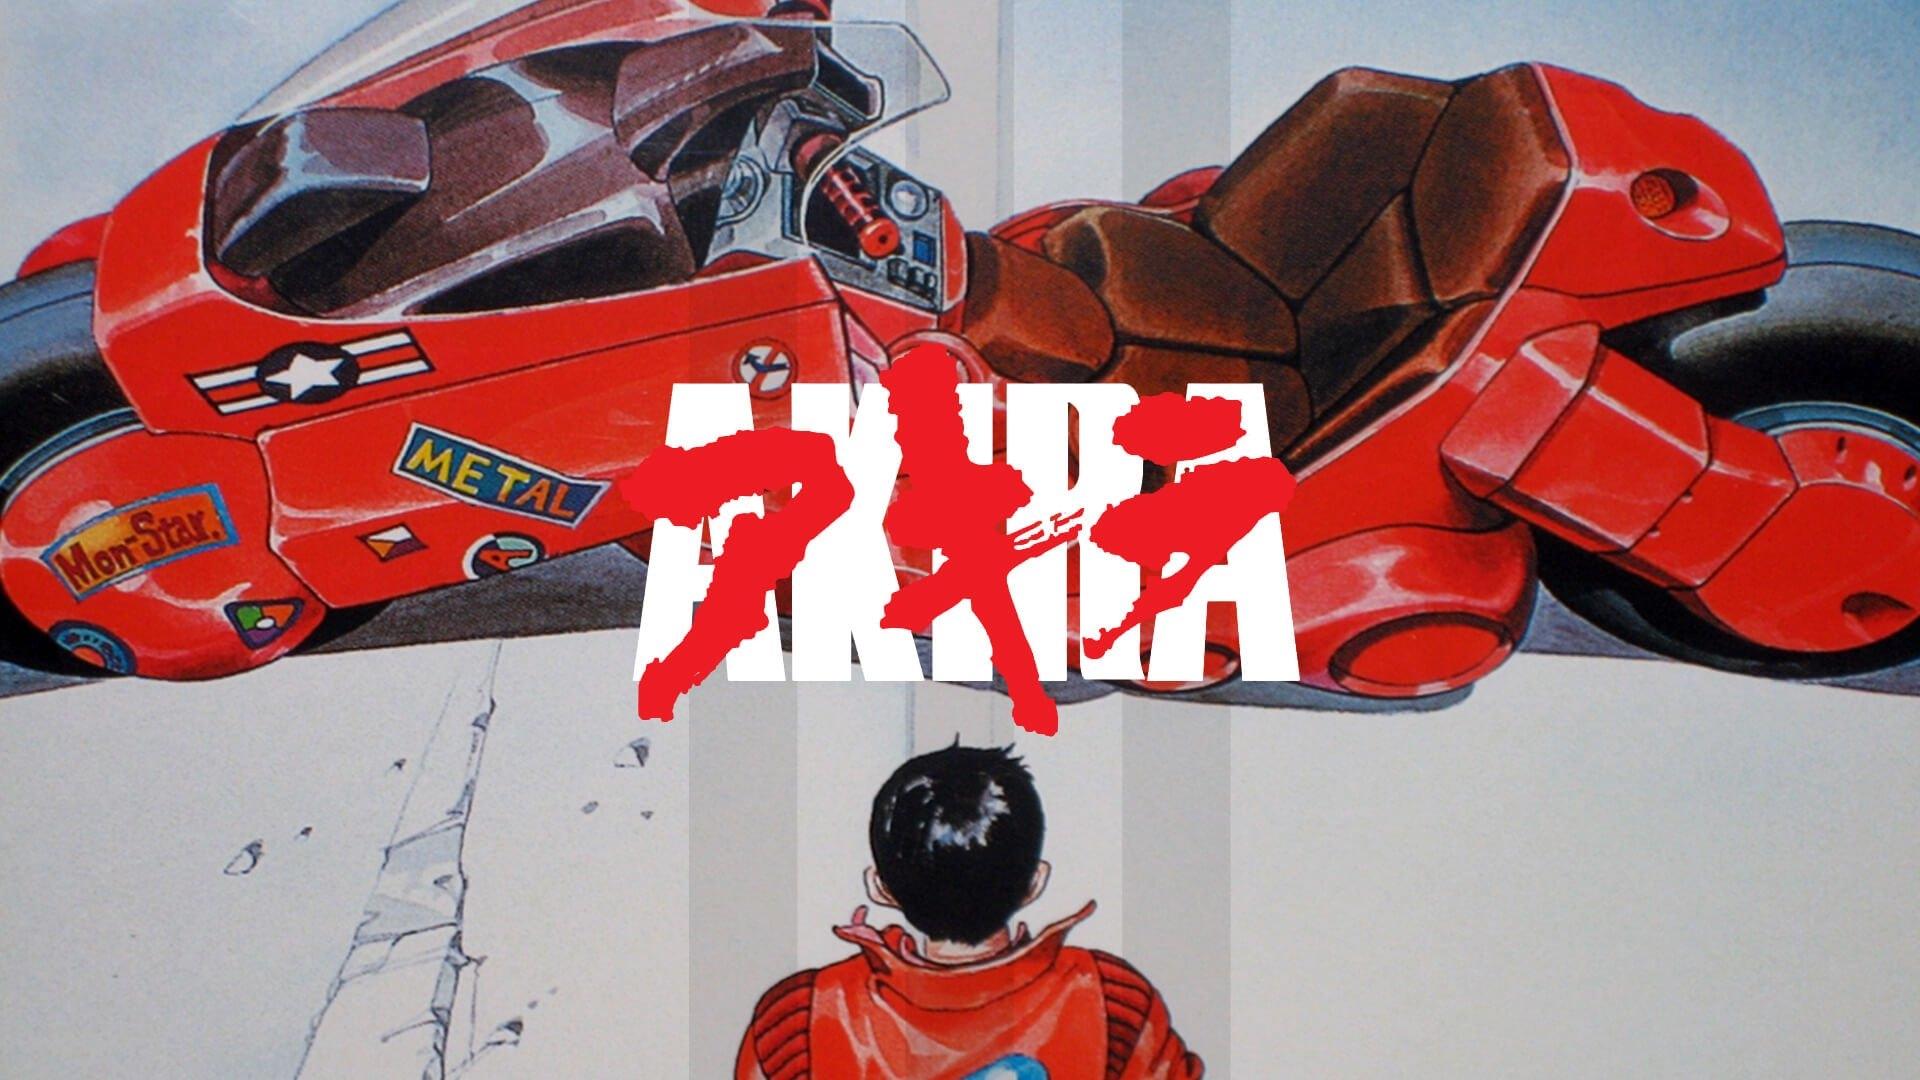 Akira Wallpaper Free Wallpaper and Background